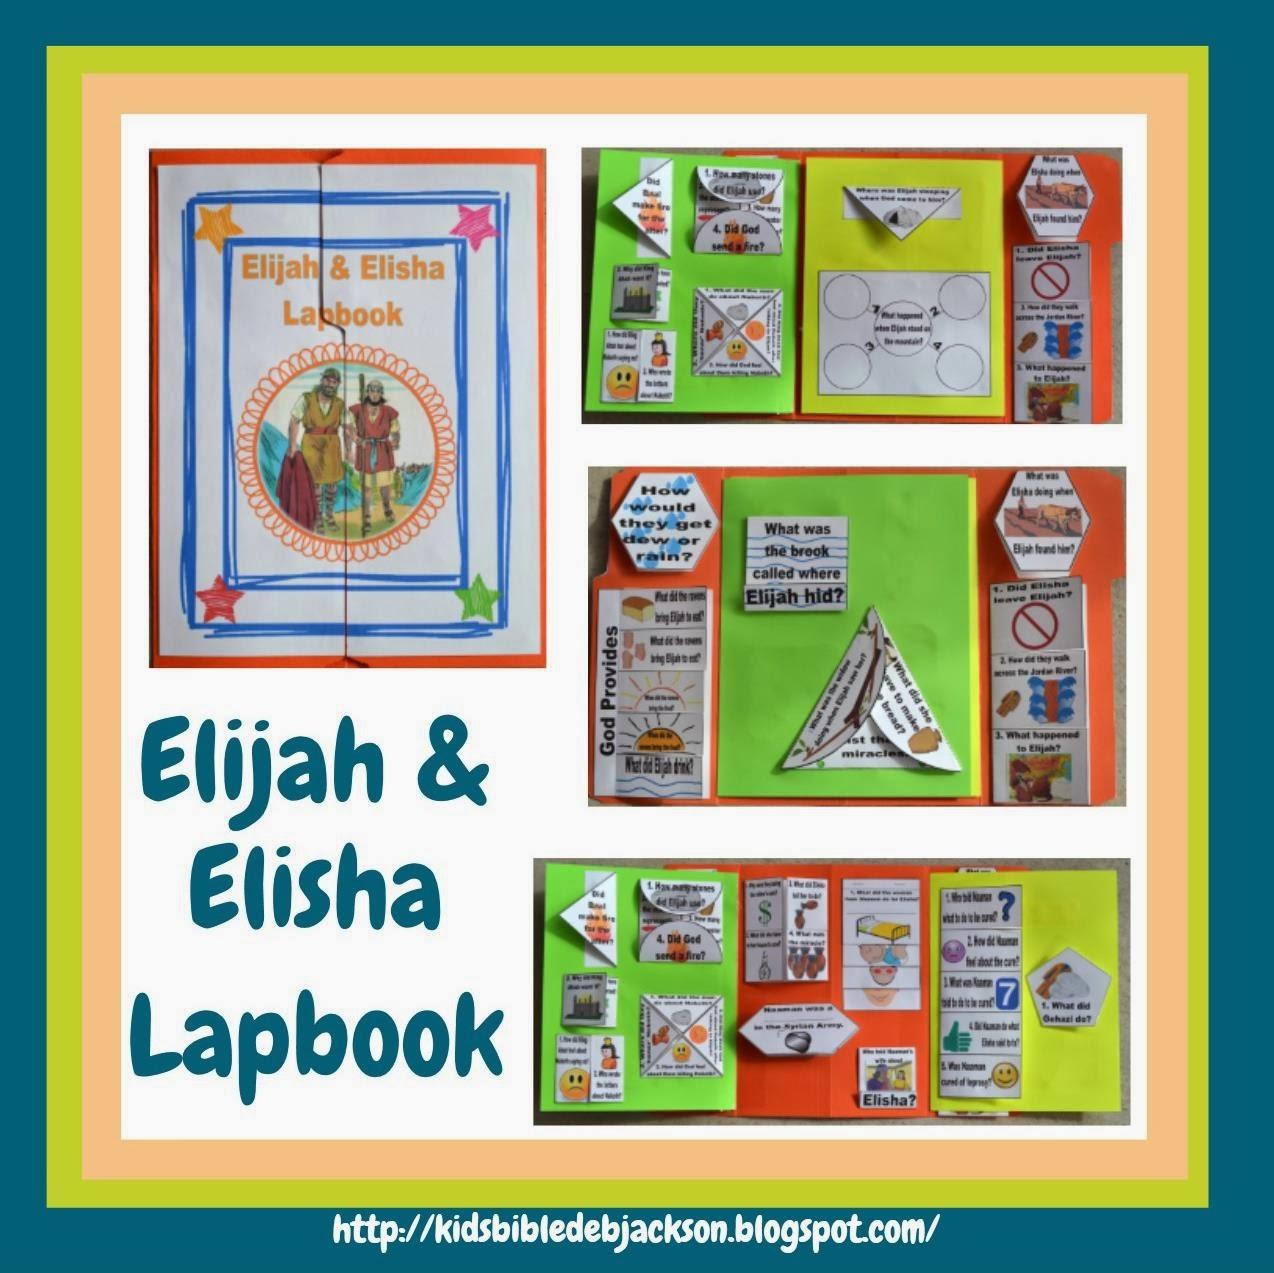 http://kidsbibledebjackson.blogspot.com/2014/02/elijah-elisha-lapbook.html